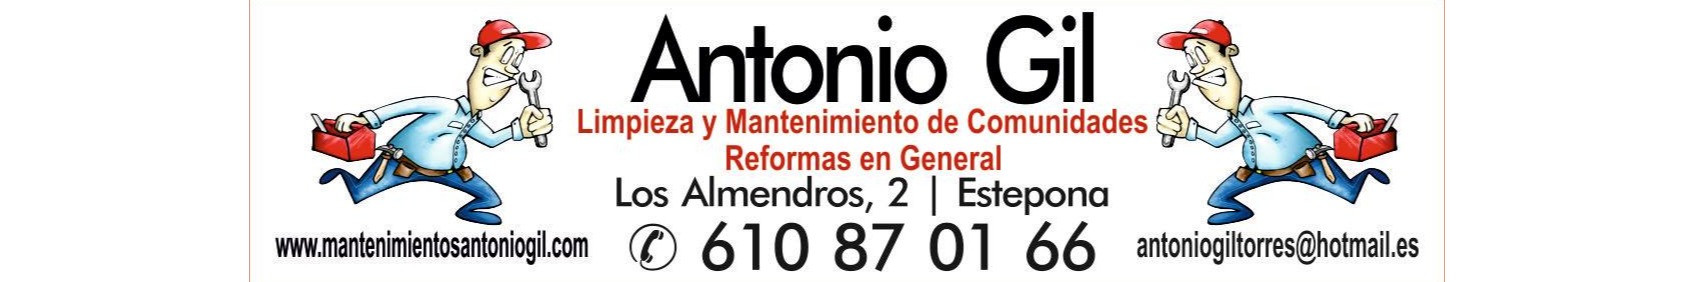 Antonio Gil Mantenimiento